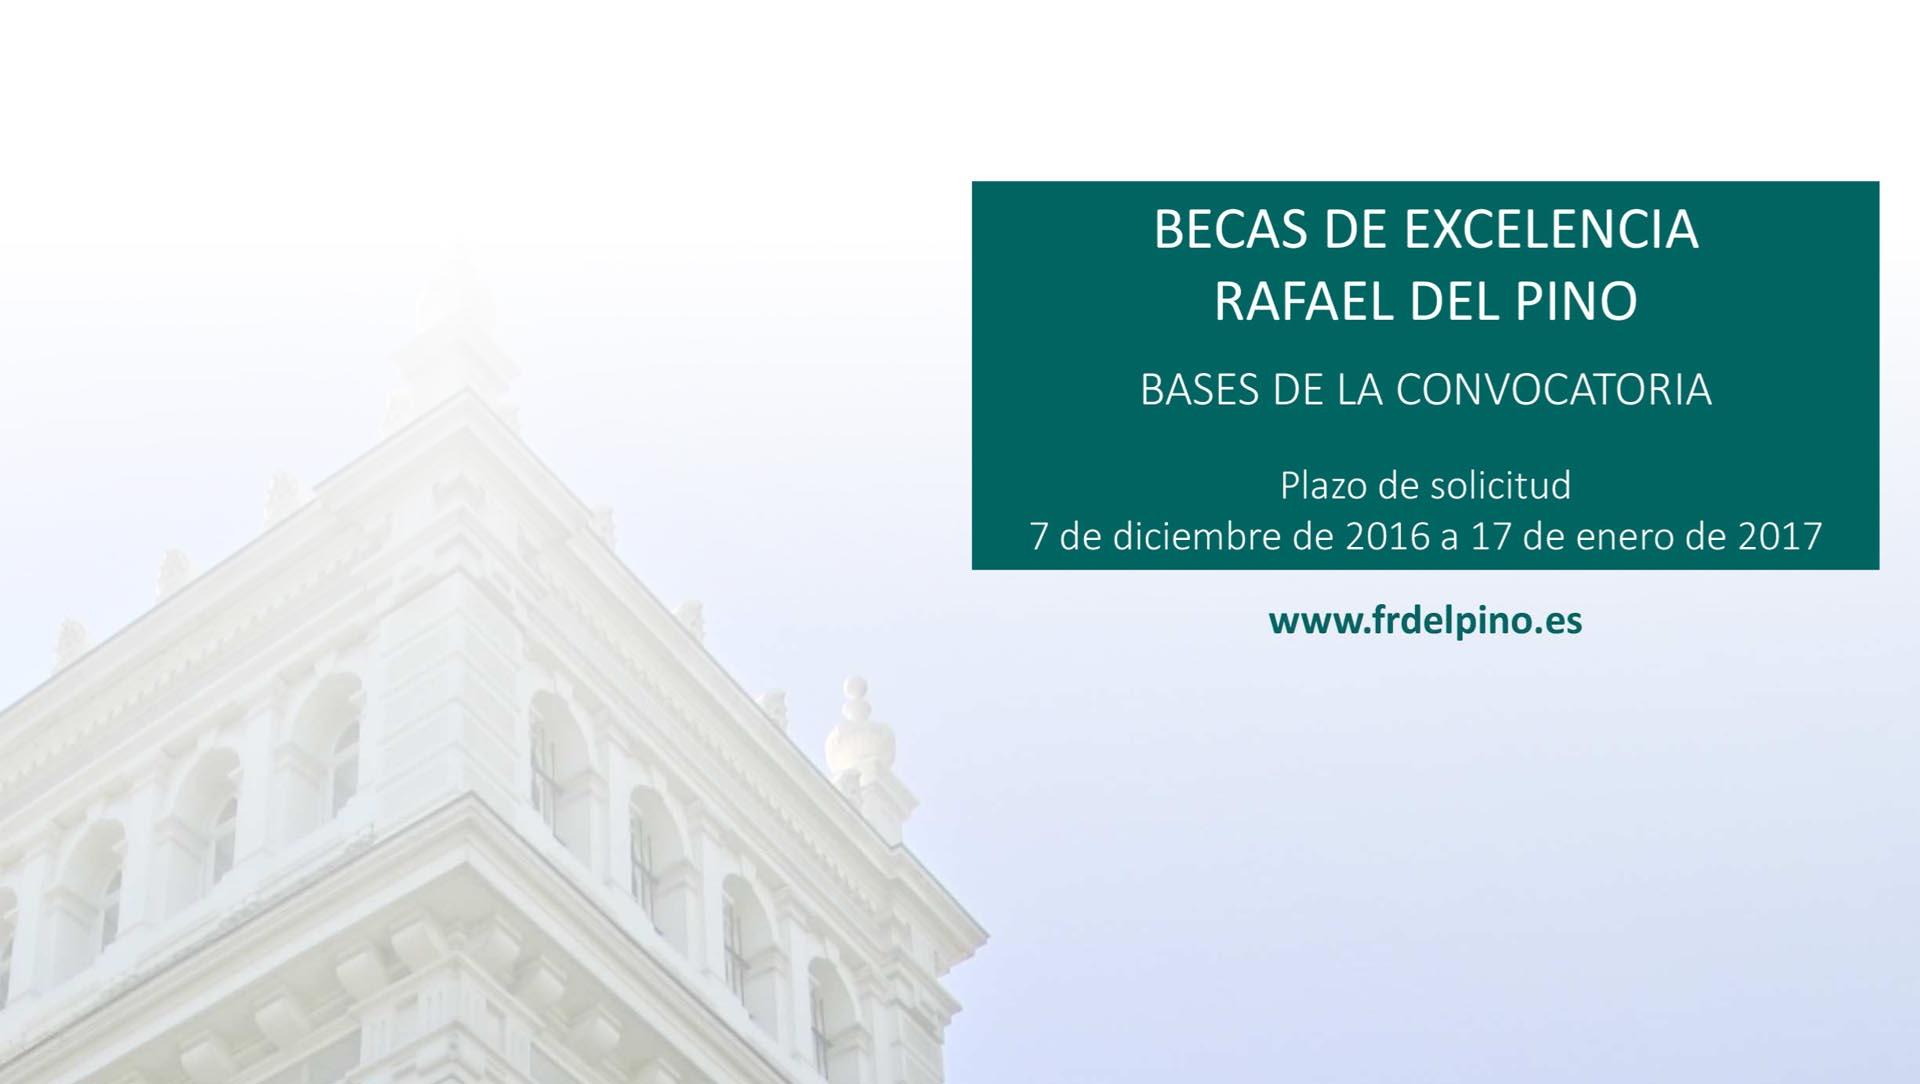 Becas de excelencia fundaci n rafael del pino - Becas de comedor 2017 ...